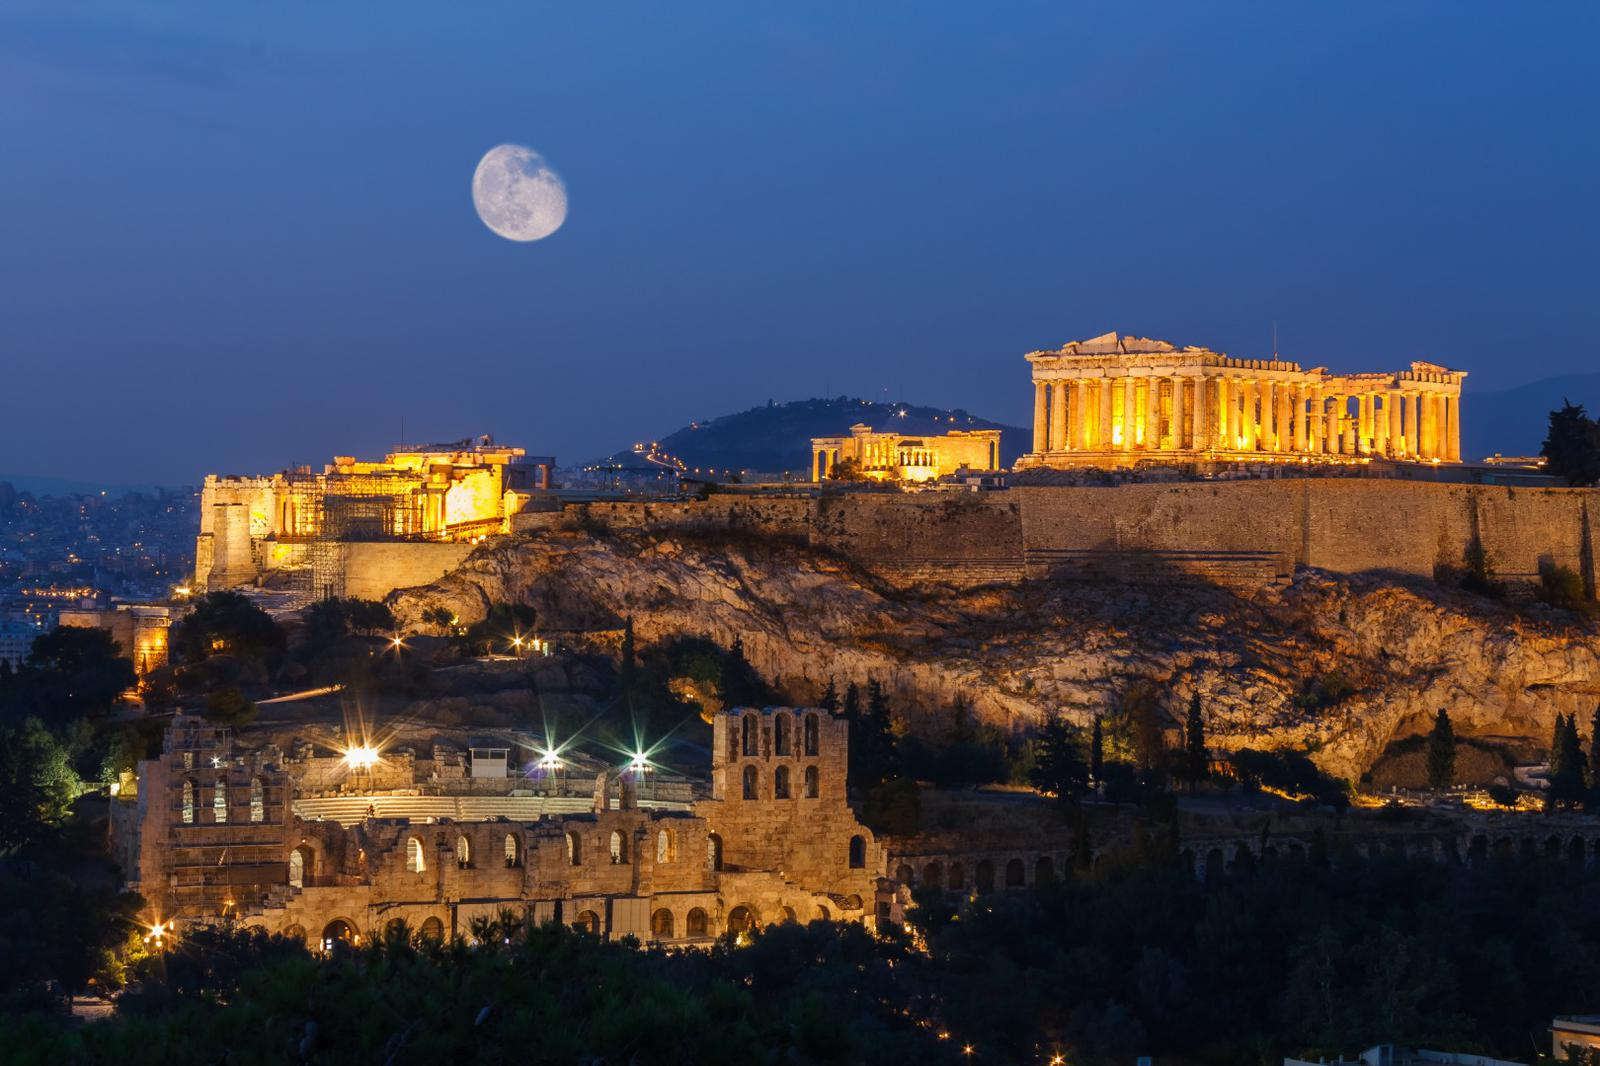 Die heiligen Felsen der Akropolis